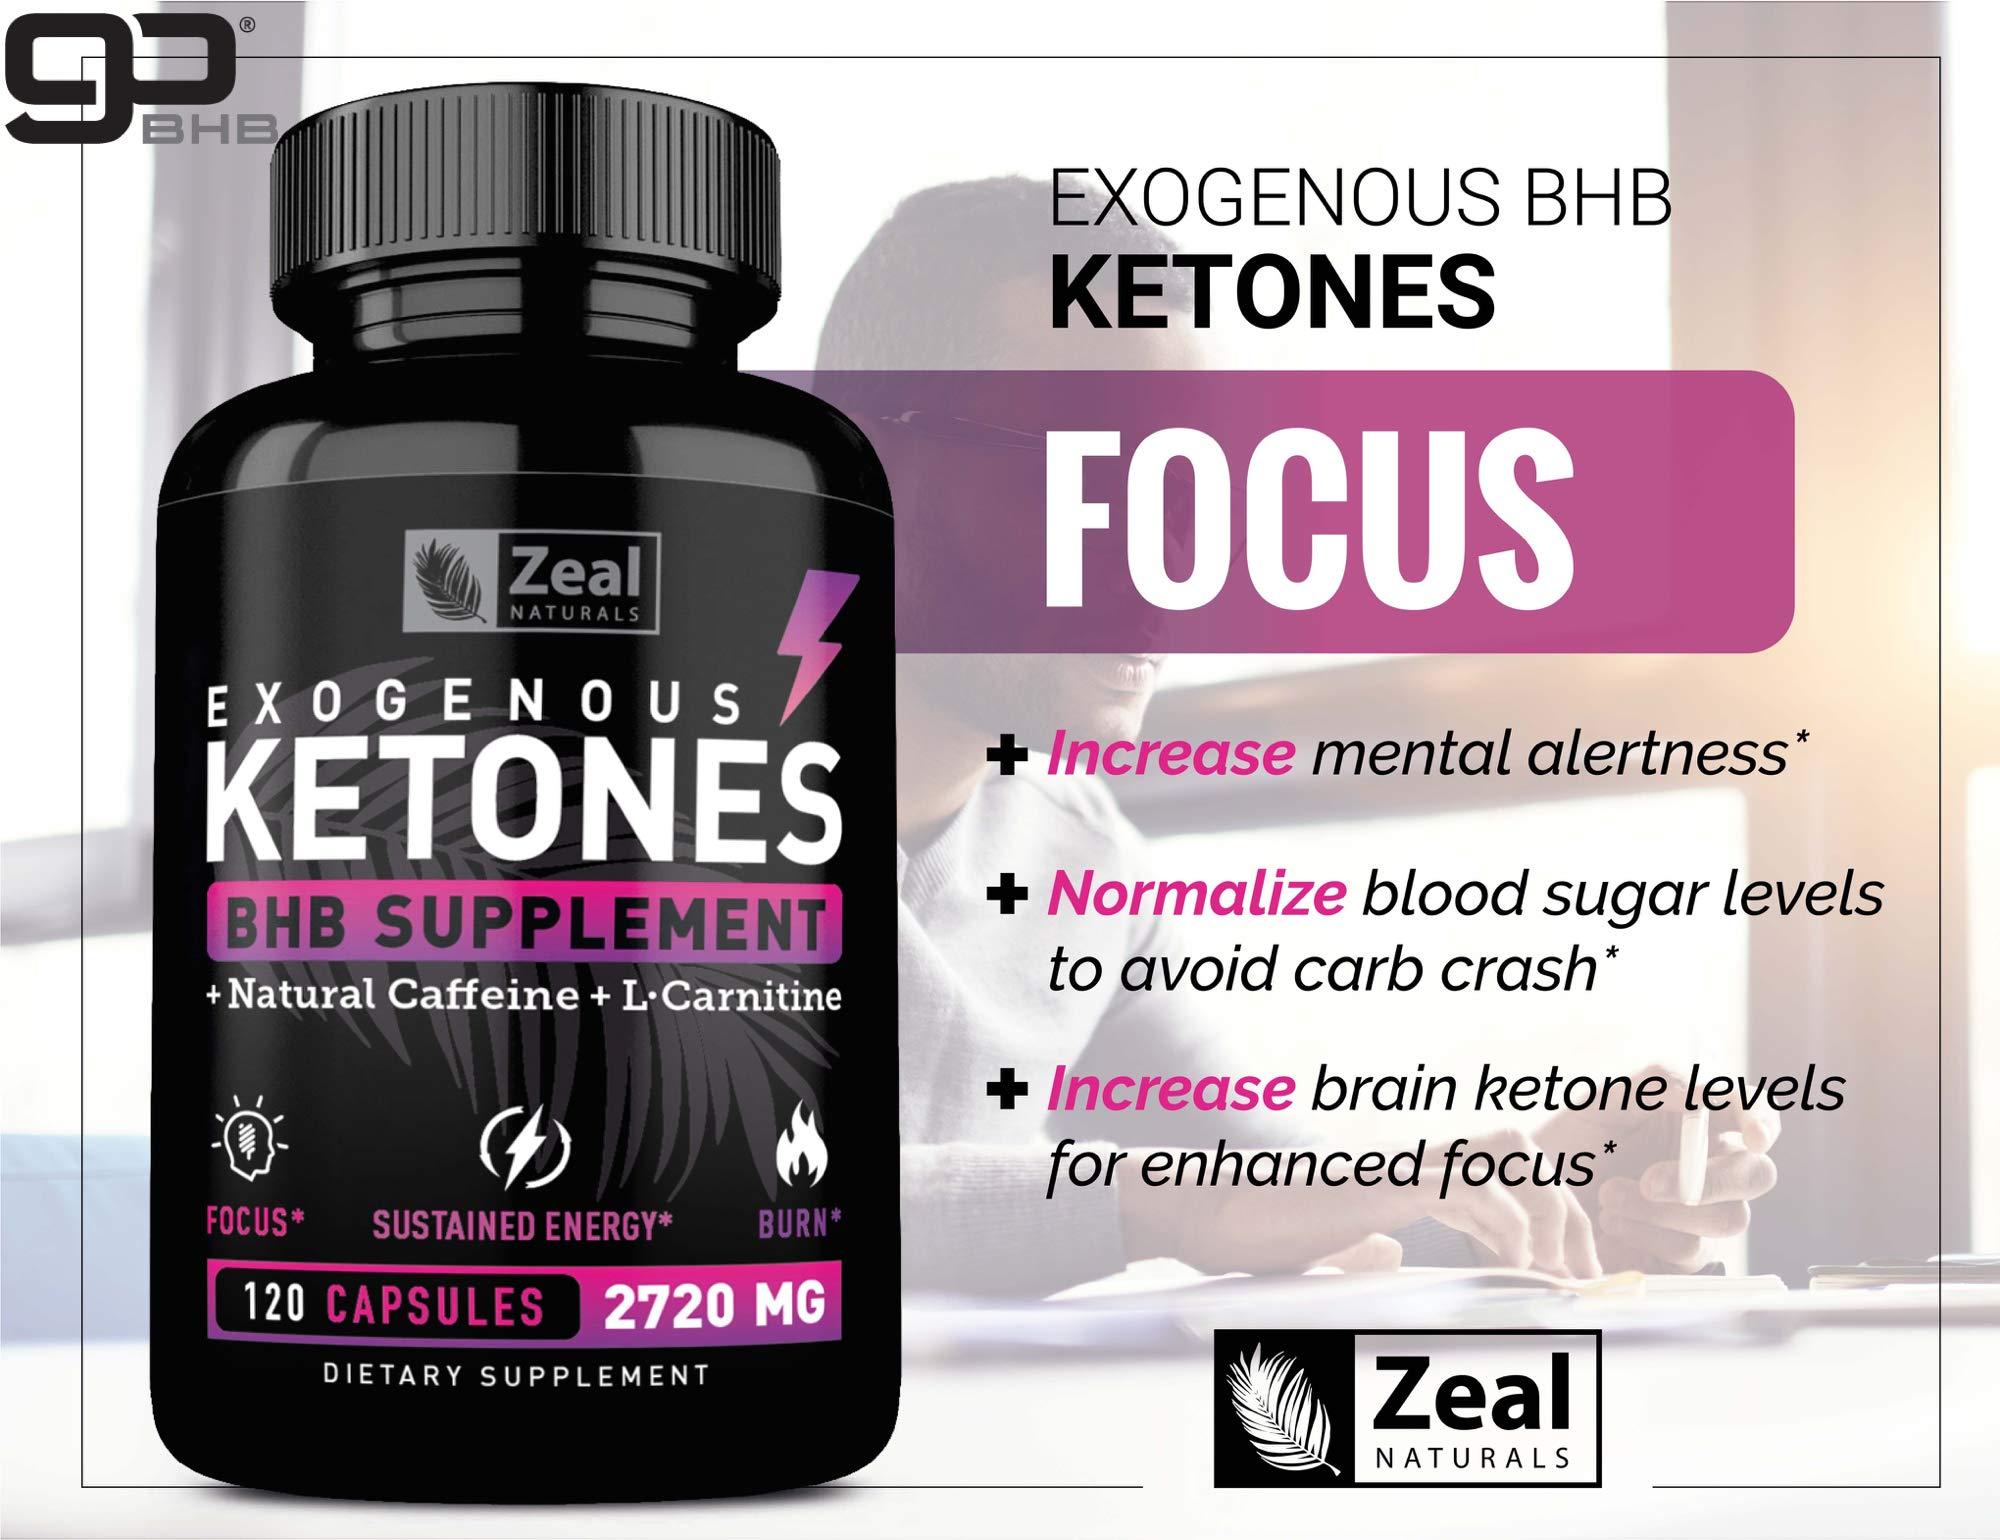 Keto BHB Exogenous Ketones Pills (2720mg | 120 Capsules) Keto Pills w. goBHB Salts, Natural Caffeine & L-Carnitine - Keto BHB Oil Capsules Beta Hydroxybutyrate for Weight Loss Keto Vitamins Keto Salts by Zeal Naturals (Image #7)